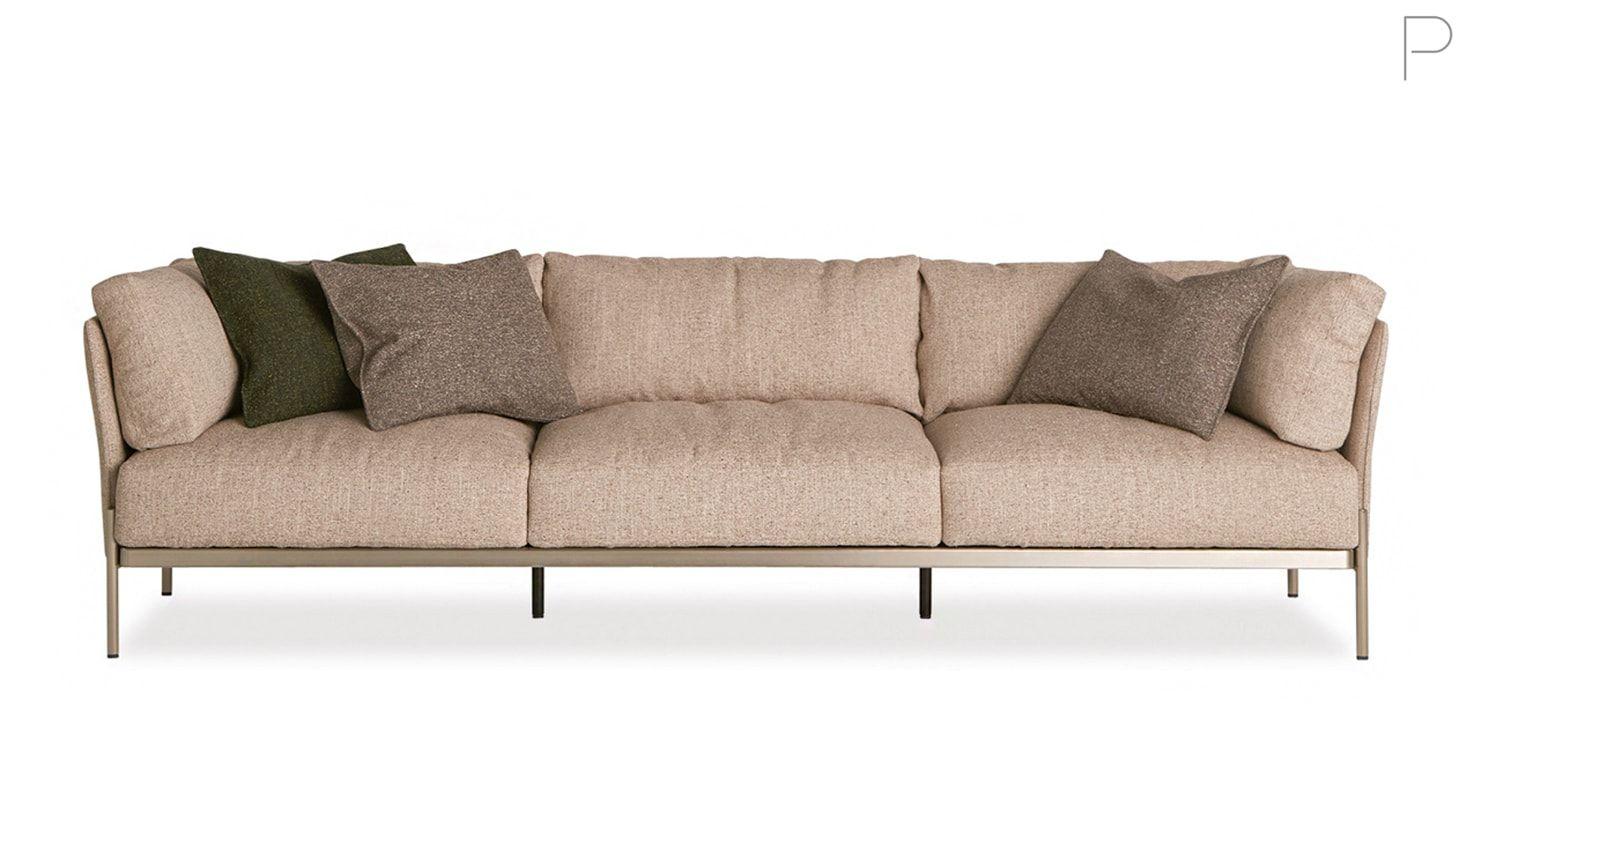 140 Sofa Ideas Sofa Furniture Swinging Chair